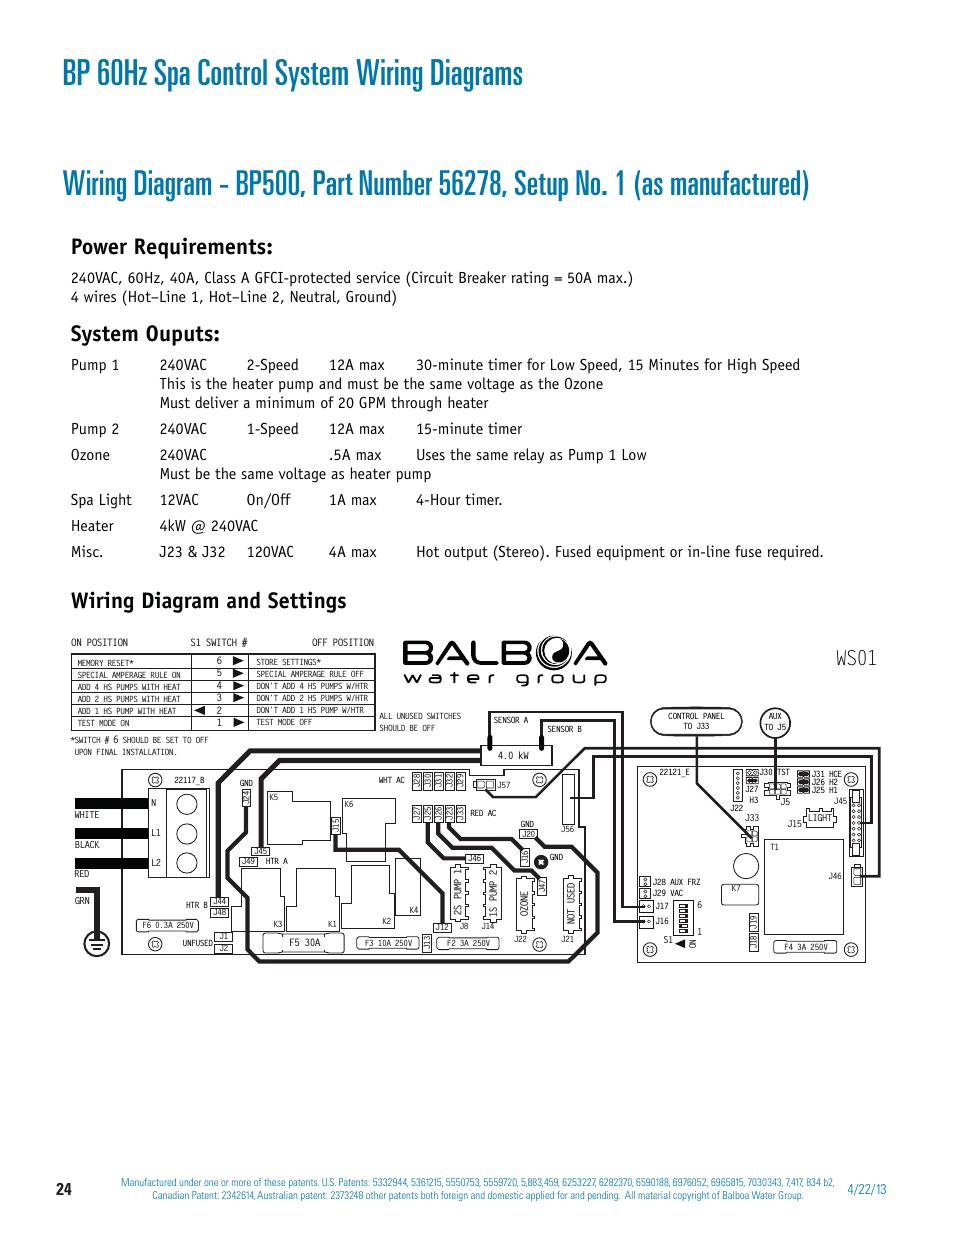 medium resolution of bp 60hz spa control system wiring diagrams power requirementsbp 60hz spa control system wiring diagrams